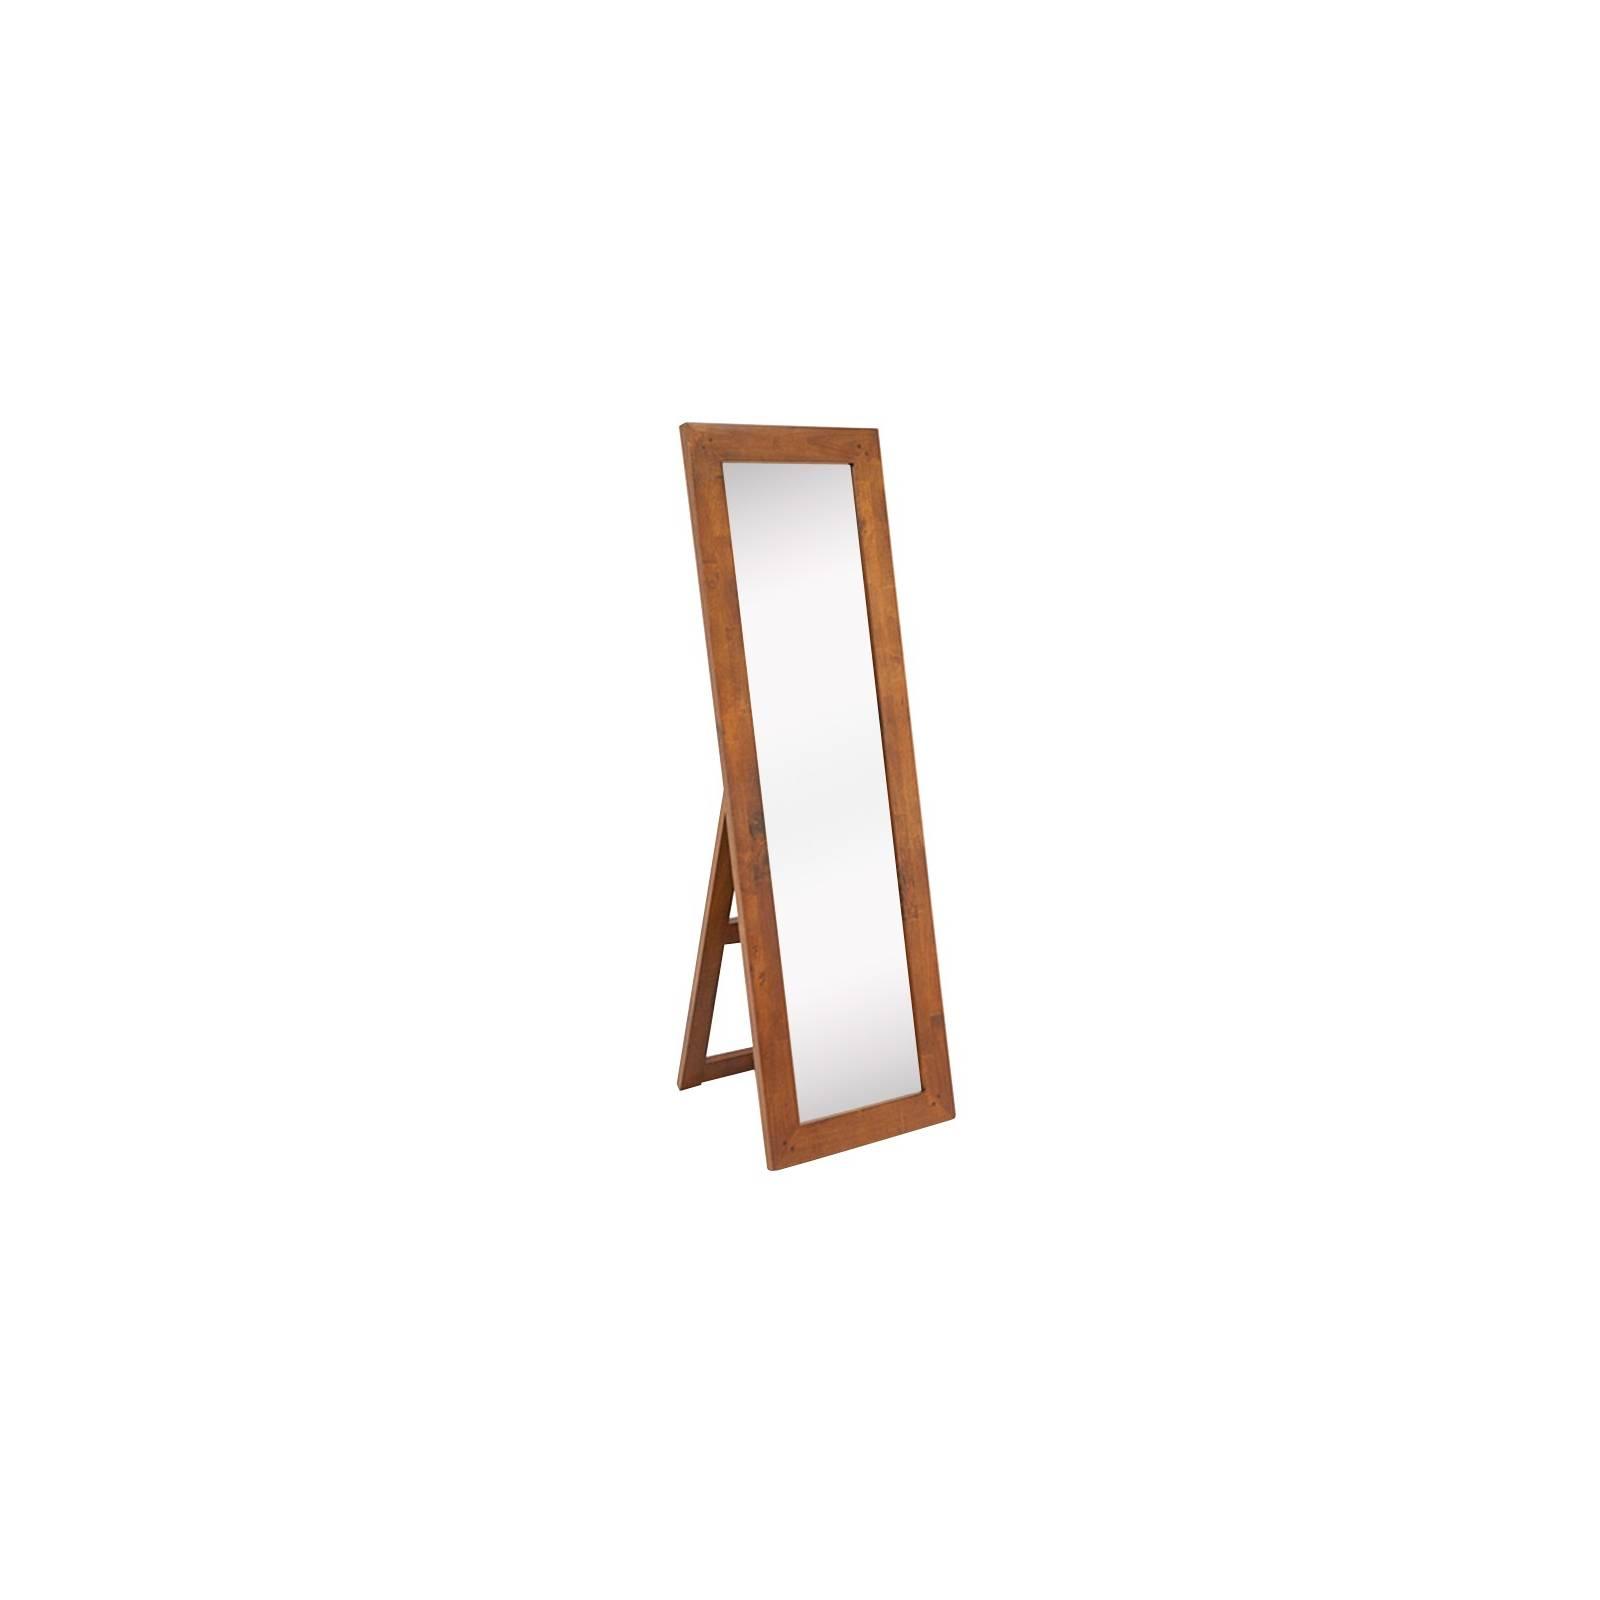 Psyché Miroir Tradition Hévéa - meuble style classique